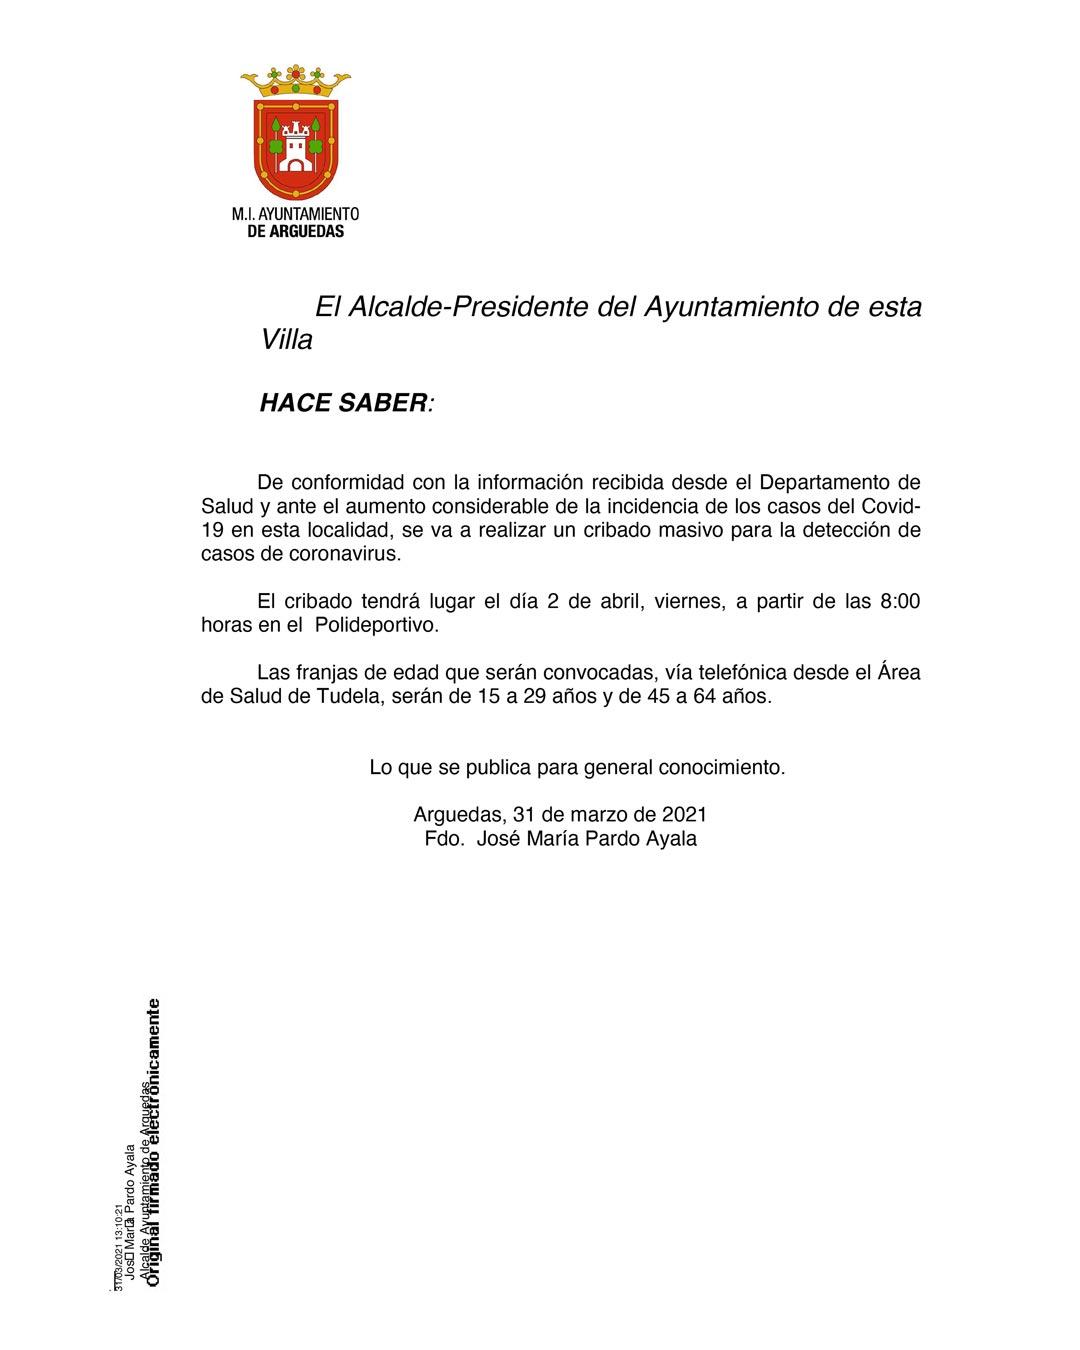 Aguedas-Cribado-Masivo-Covid-2021